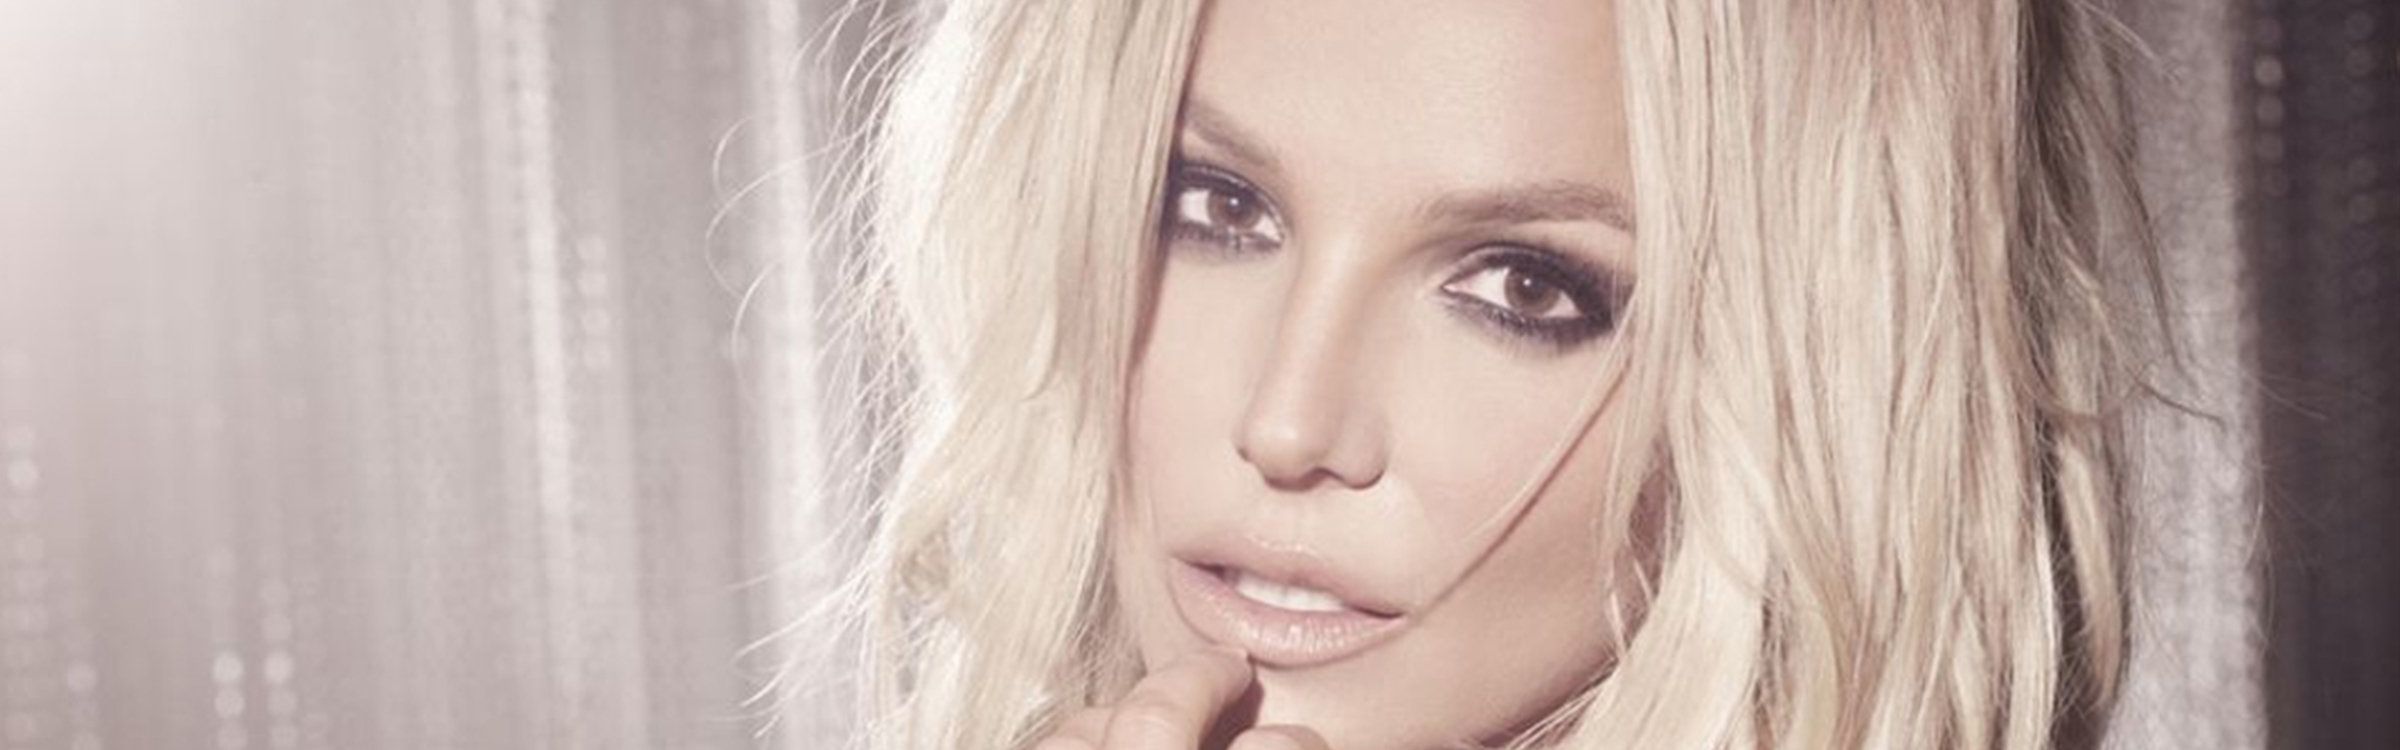 Britney vma header